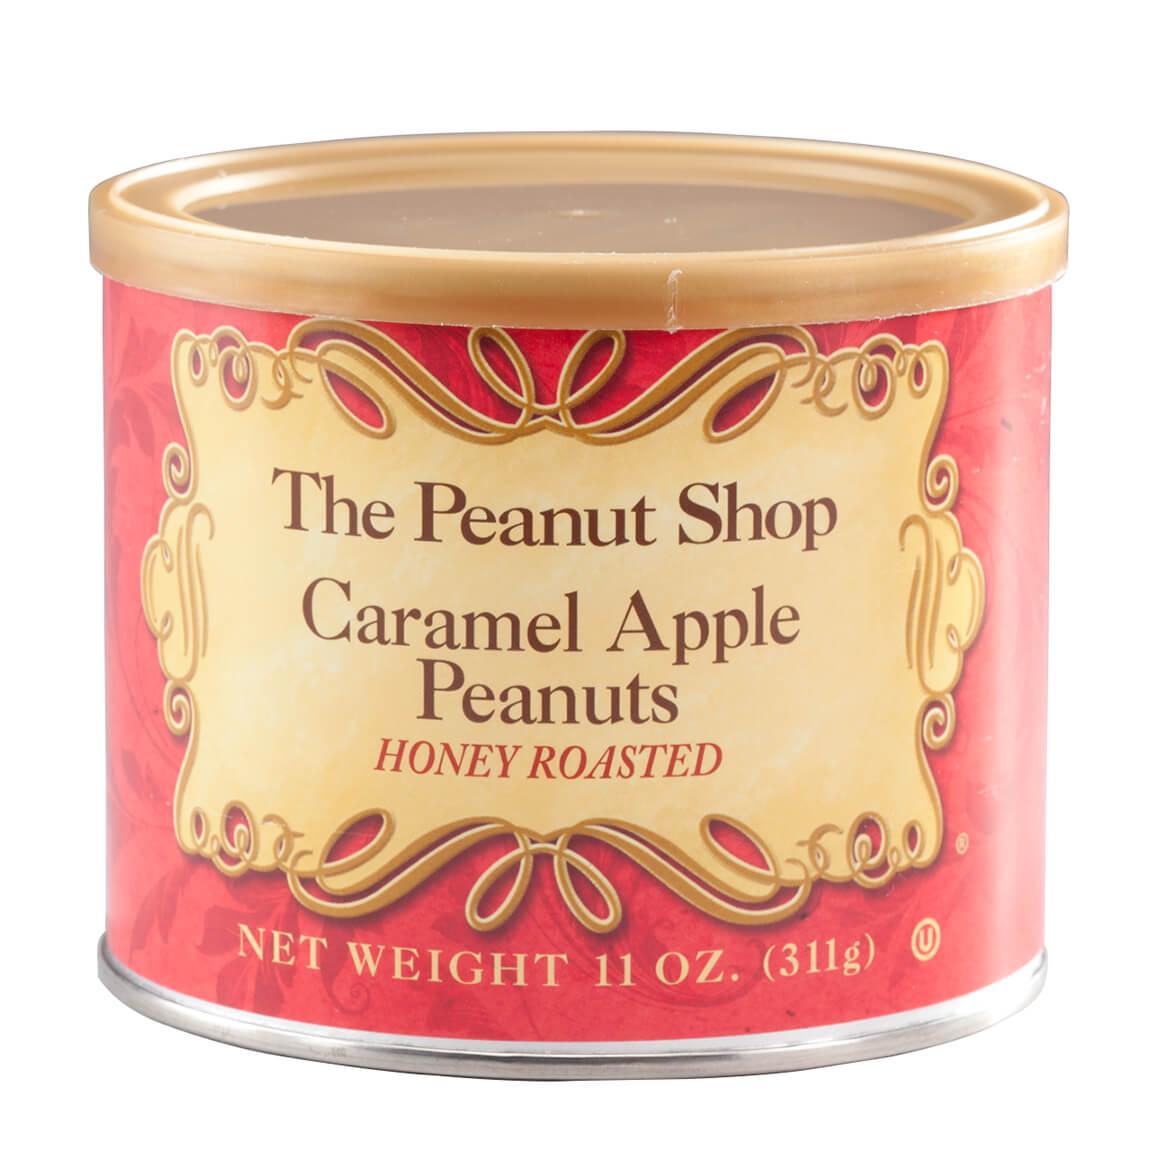 The Peanut Shop® Caramel Apple Honey Roasted Peanuts, 11 oz.